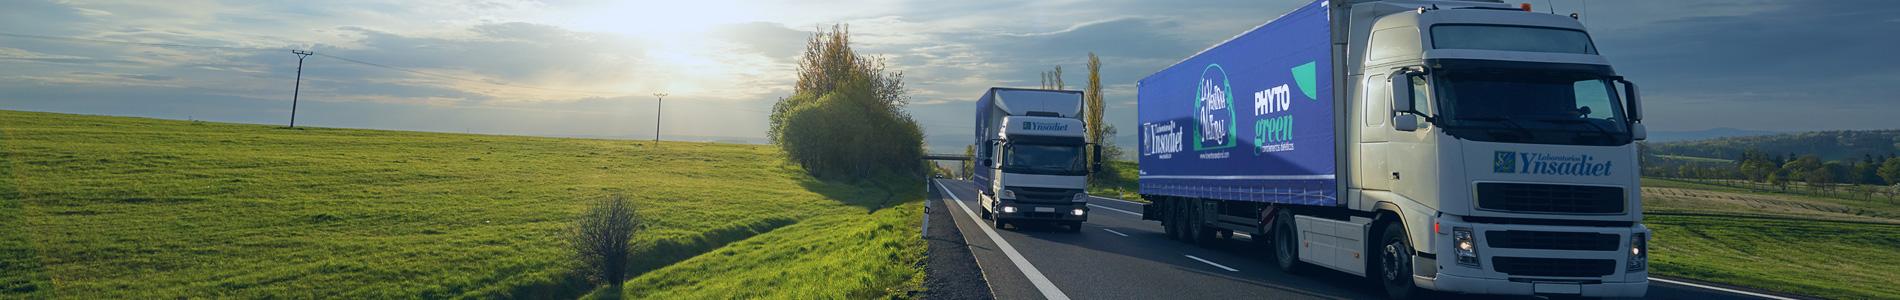 Camiones2-Ynsadiet